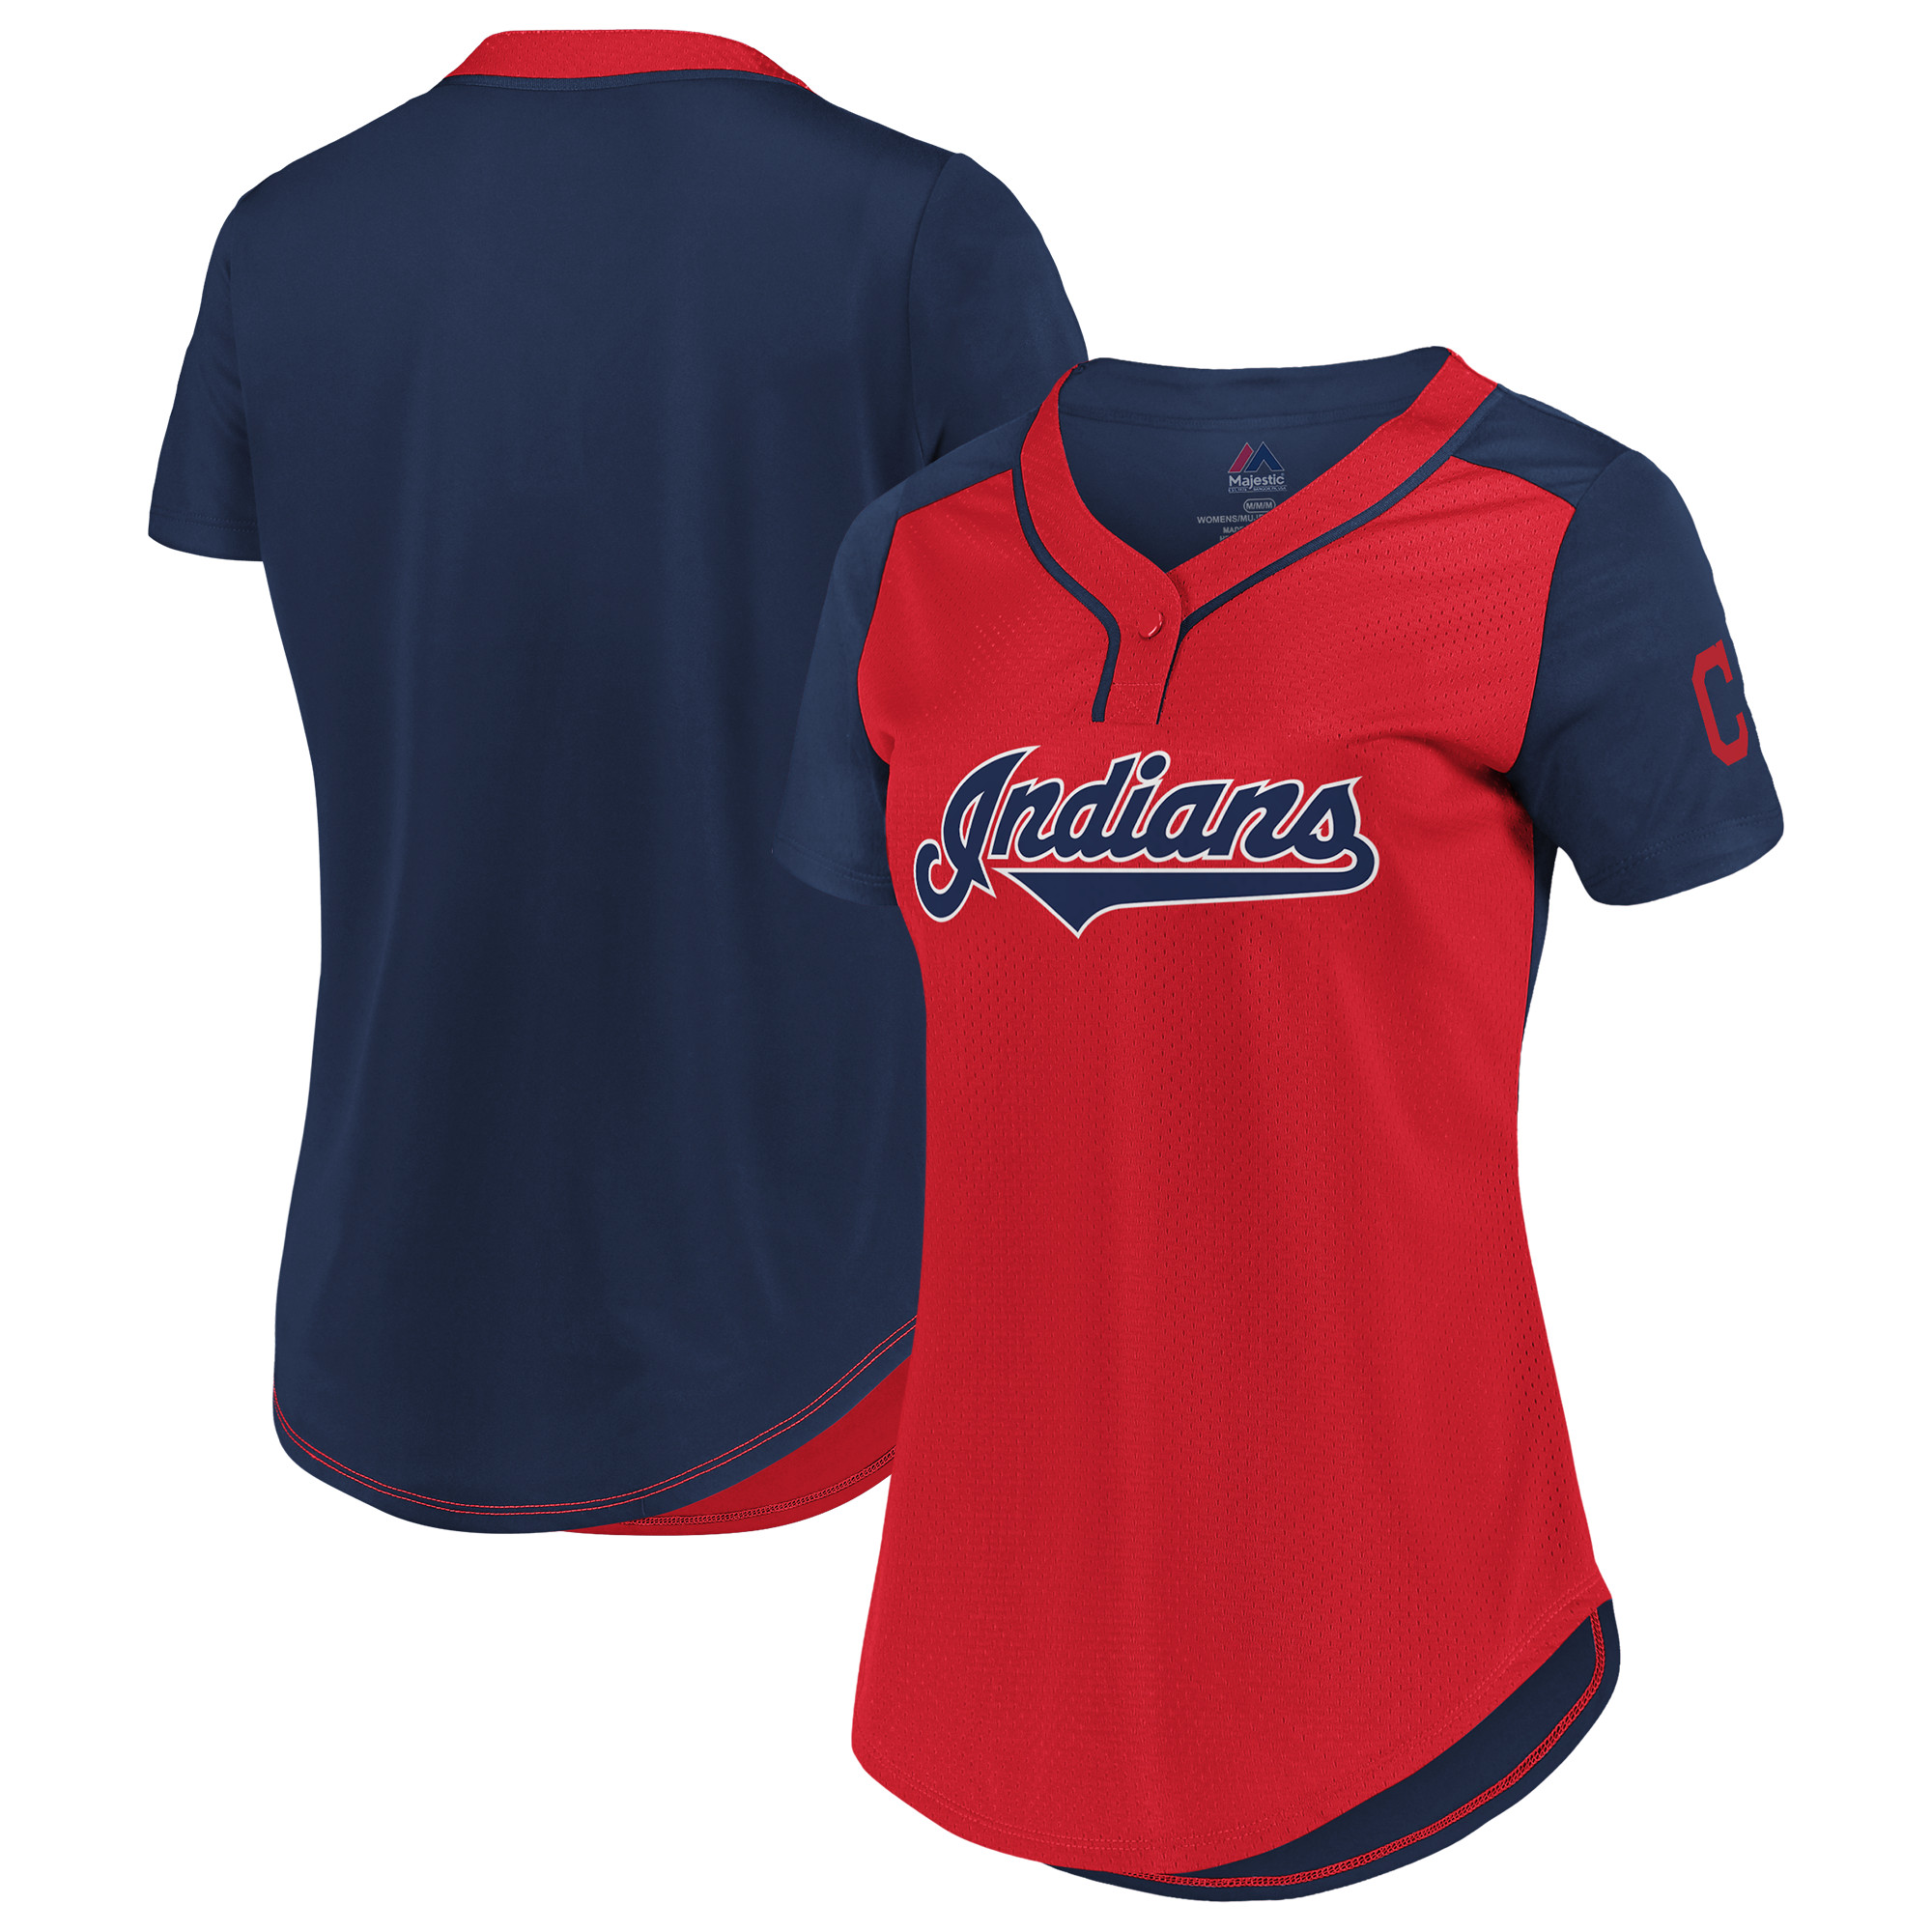 Cleveland Indians Majestic Women's League Diva Mesh T-Shirt - Red/Navy